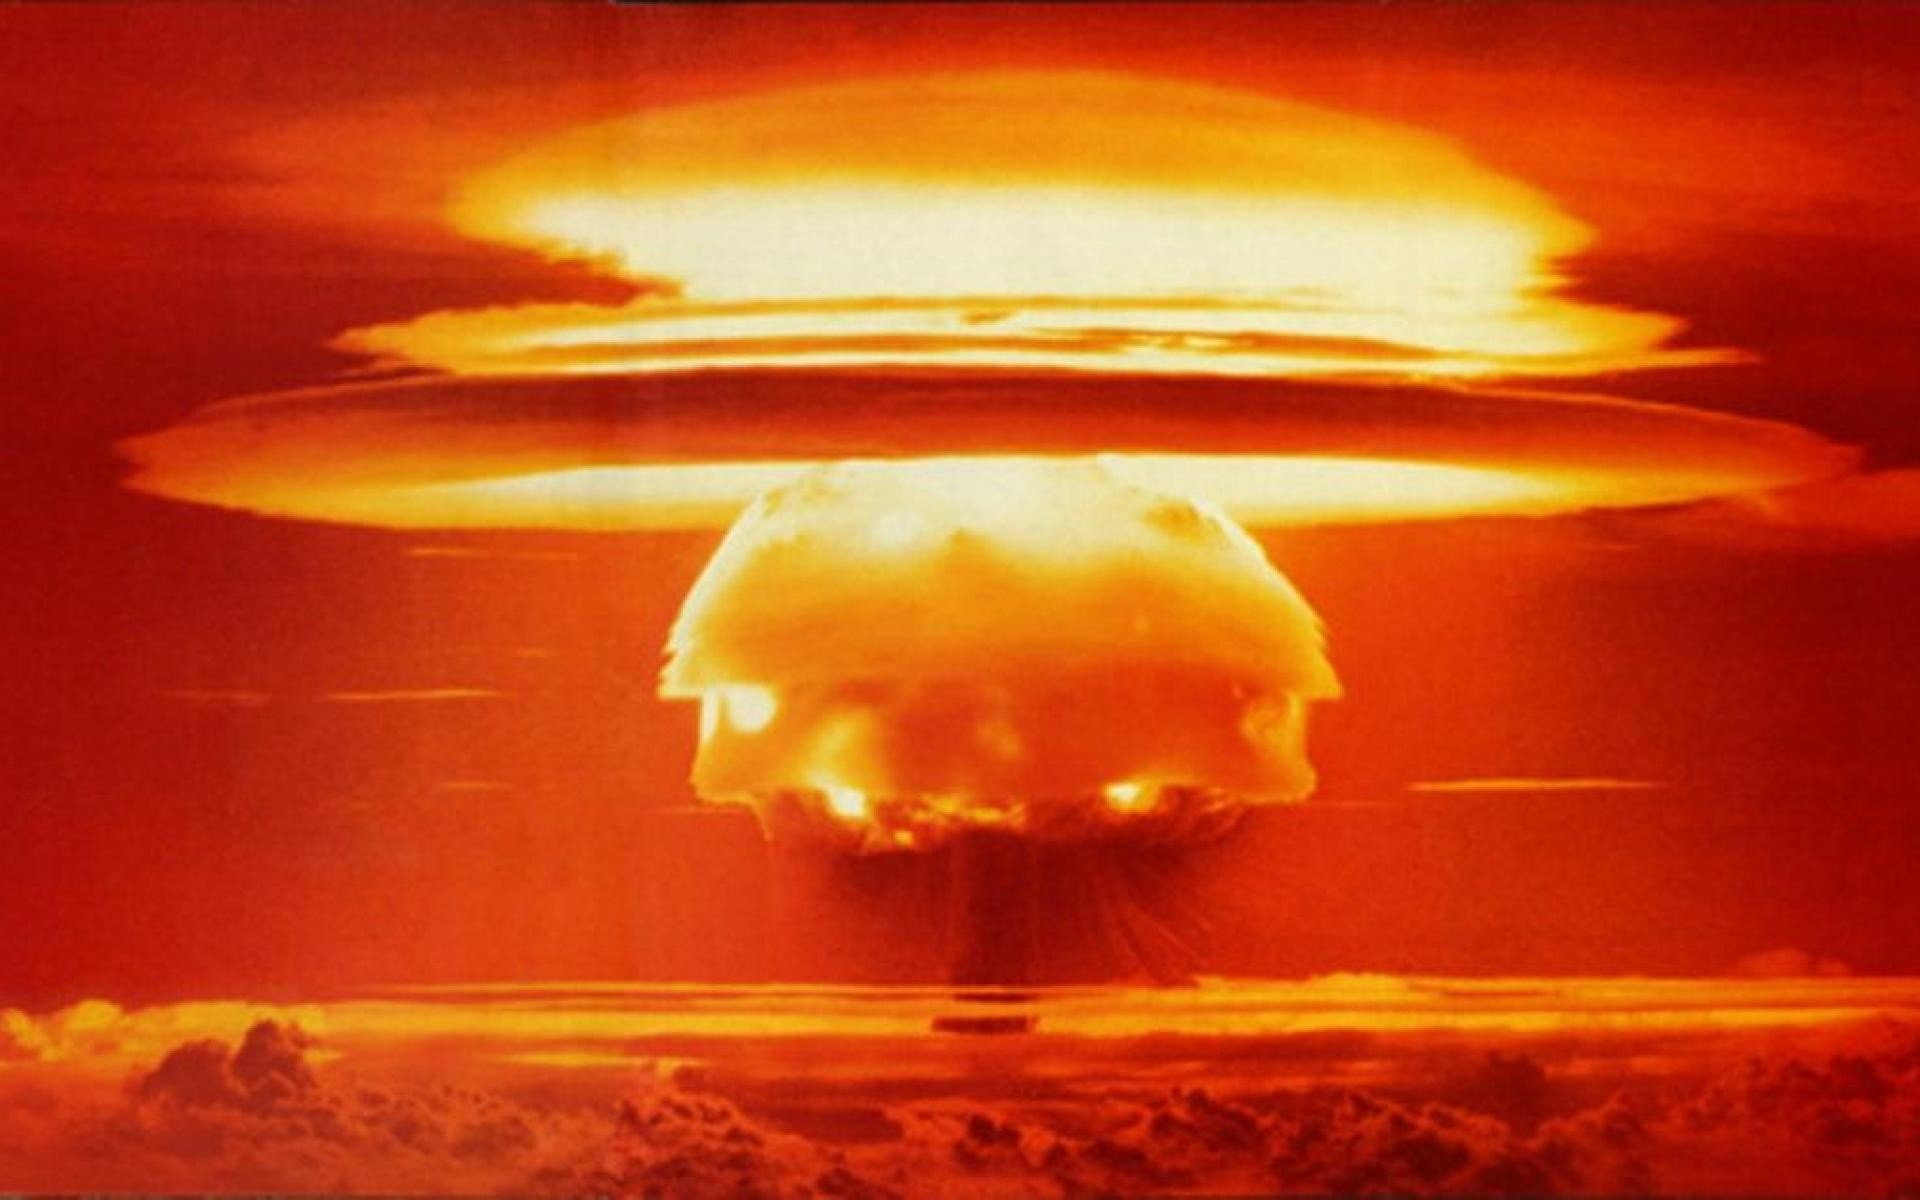 Res: 1920x1200, Atomic Bomb Wallpaper HD - WallpaperSafari